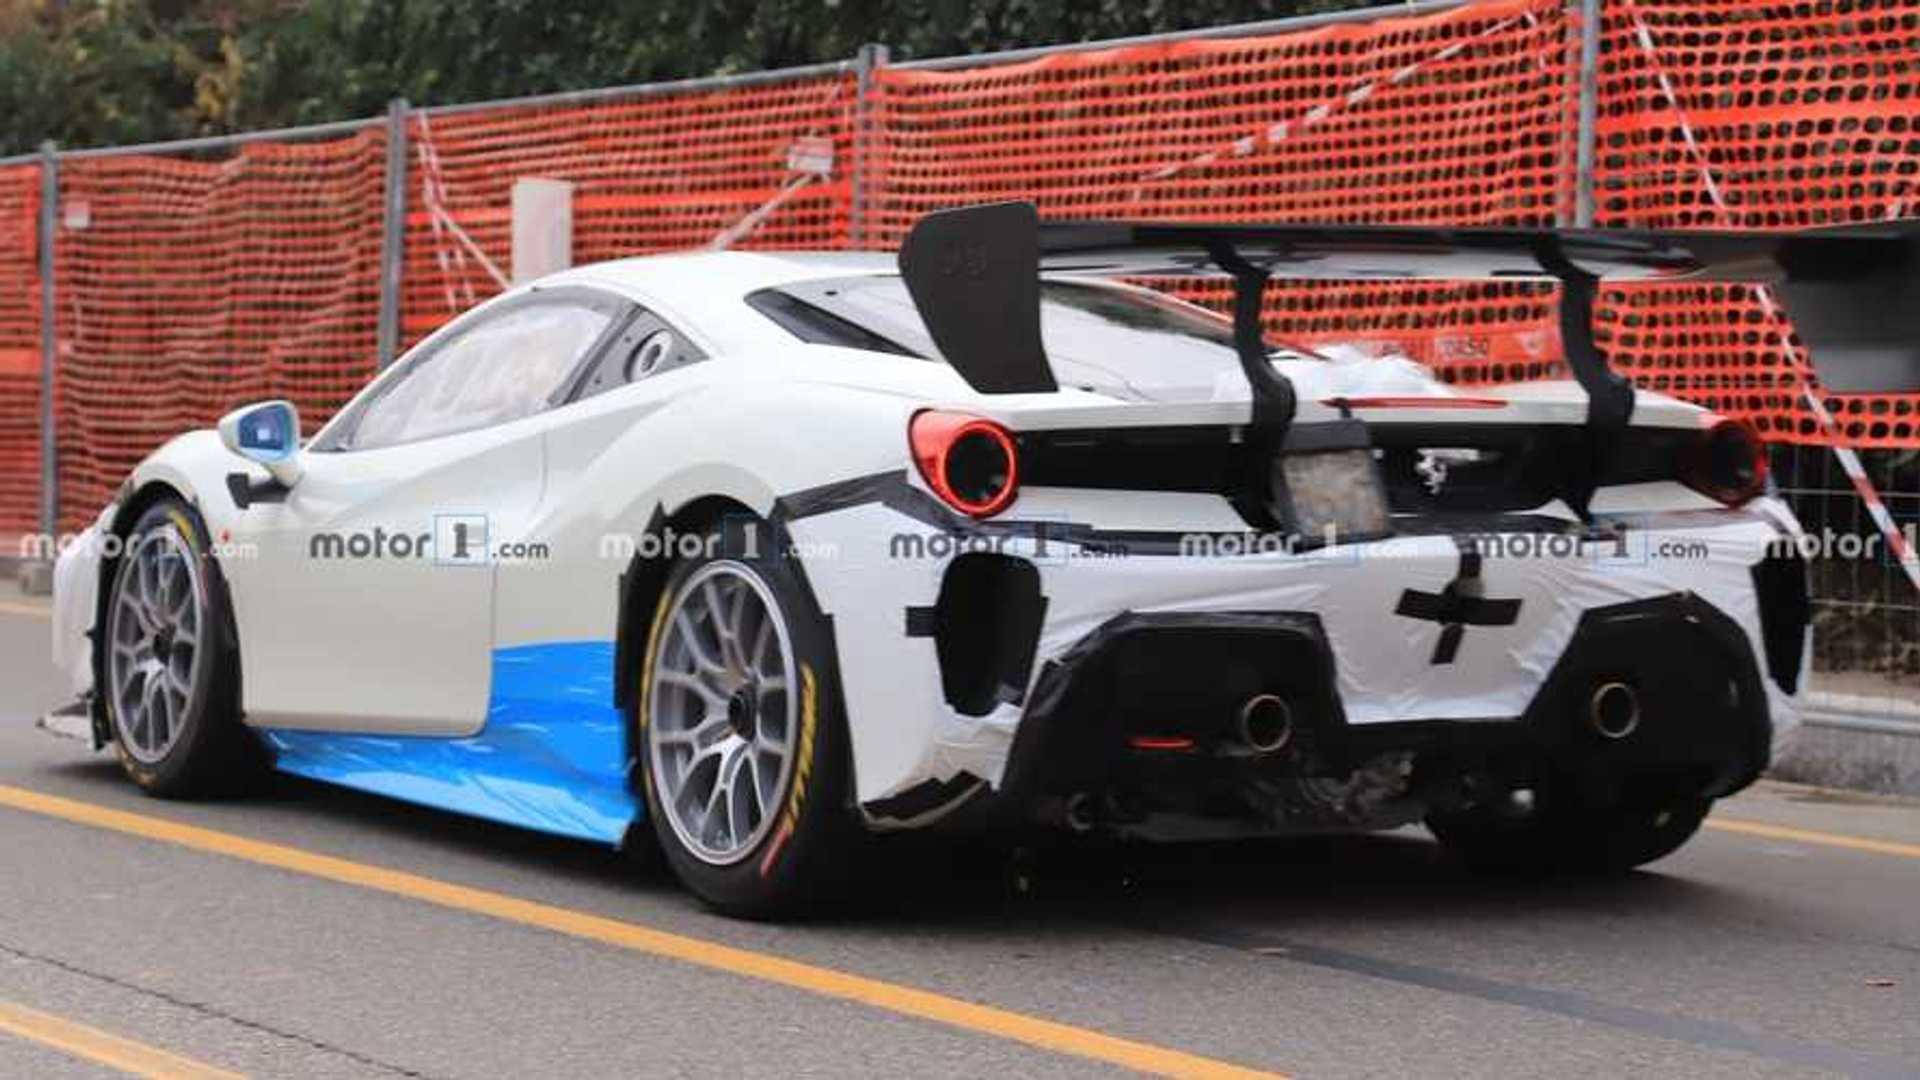 Wild Ferrari Prototype Spied By Motor1.com Reader